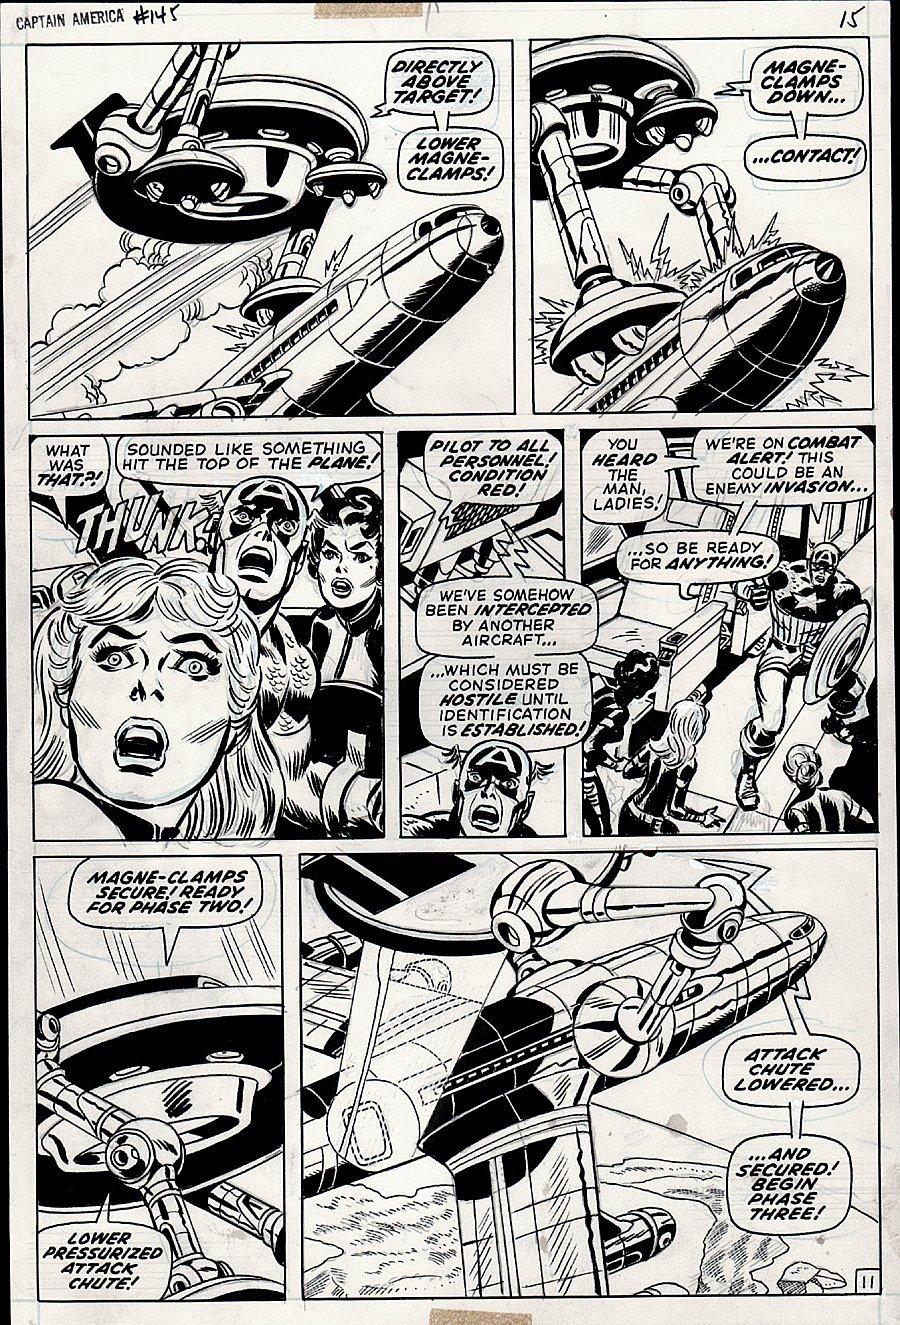 Captain America #145 p 11 (Captain America, Agent 13 [Sharon Carter] Valentina de la Fontaine!) 1971